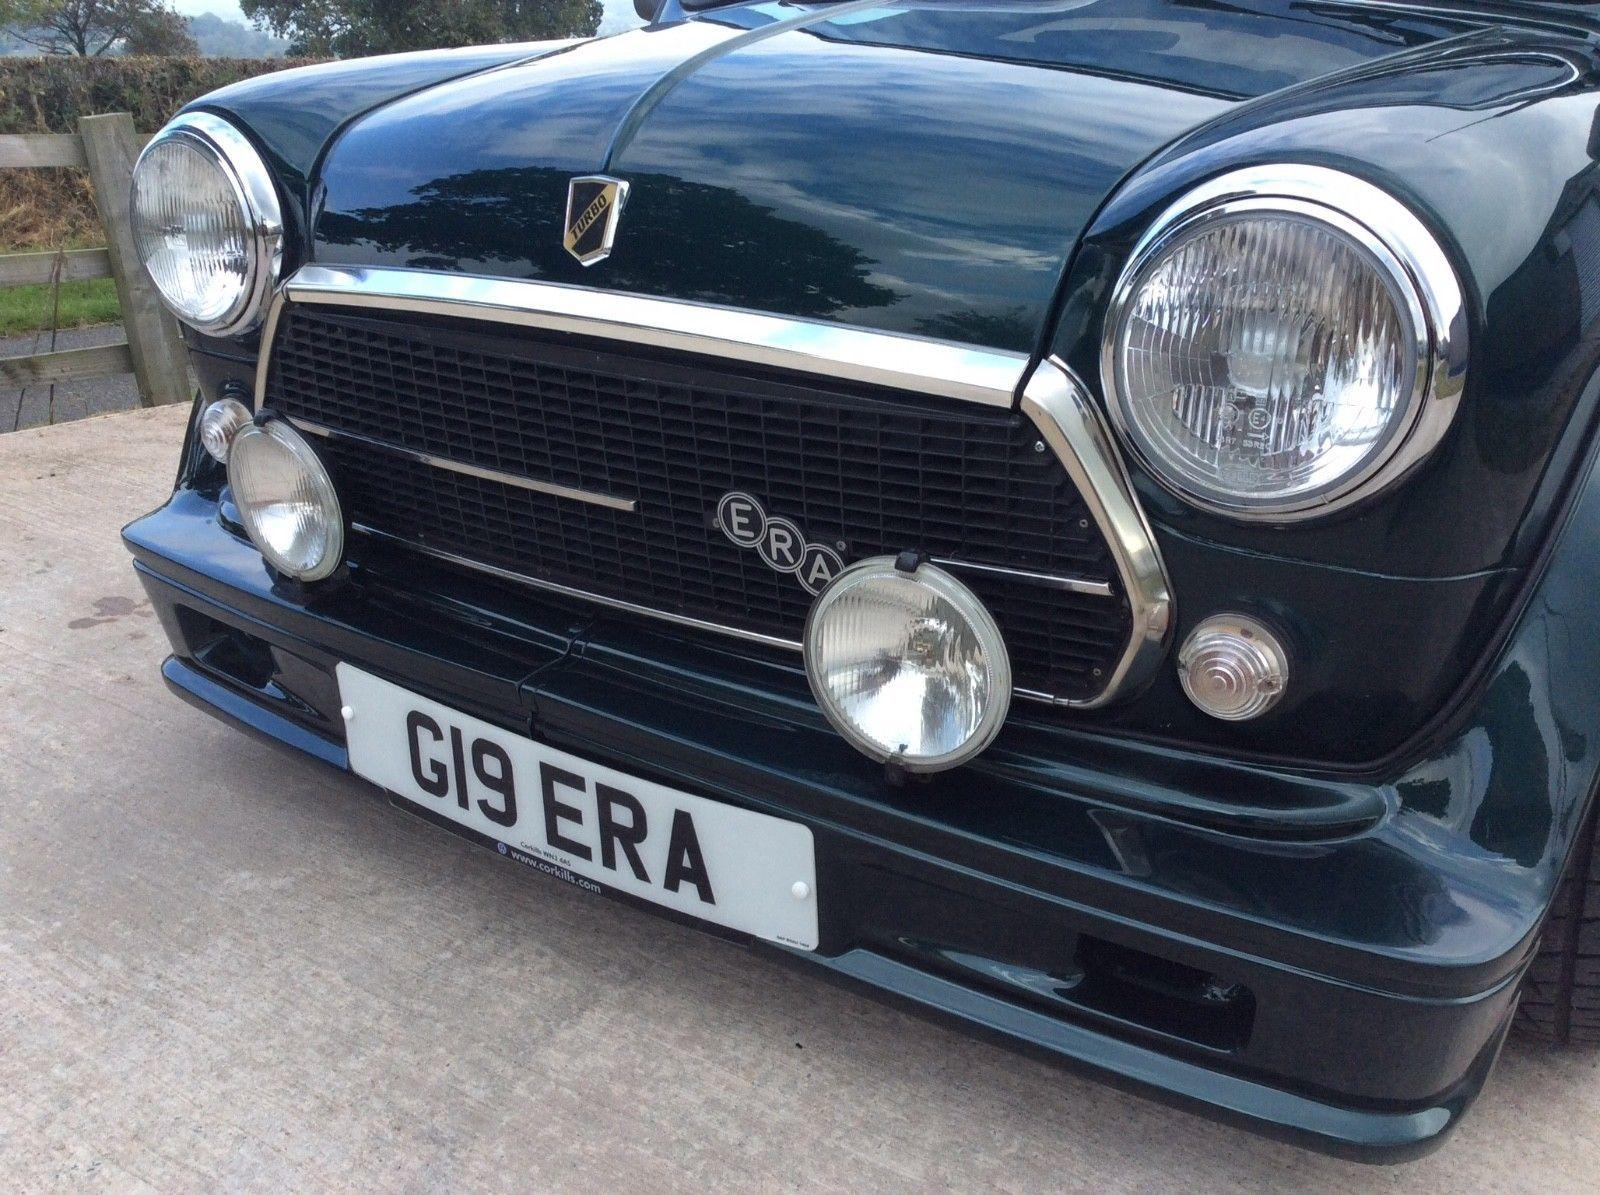 Mini Era Turbo (Extremely rare collectors car) | Minis, Collector ...